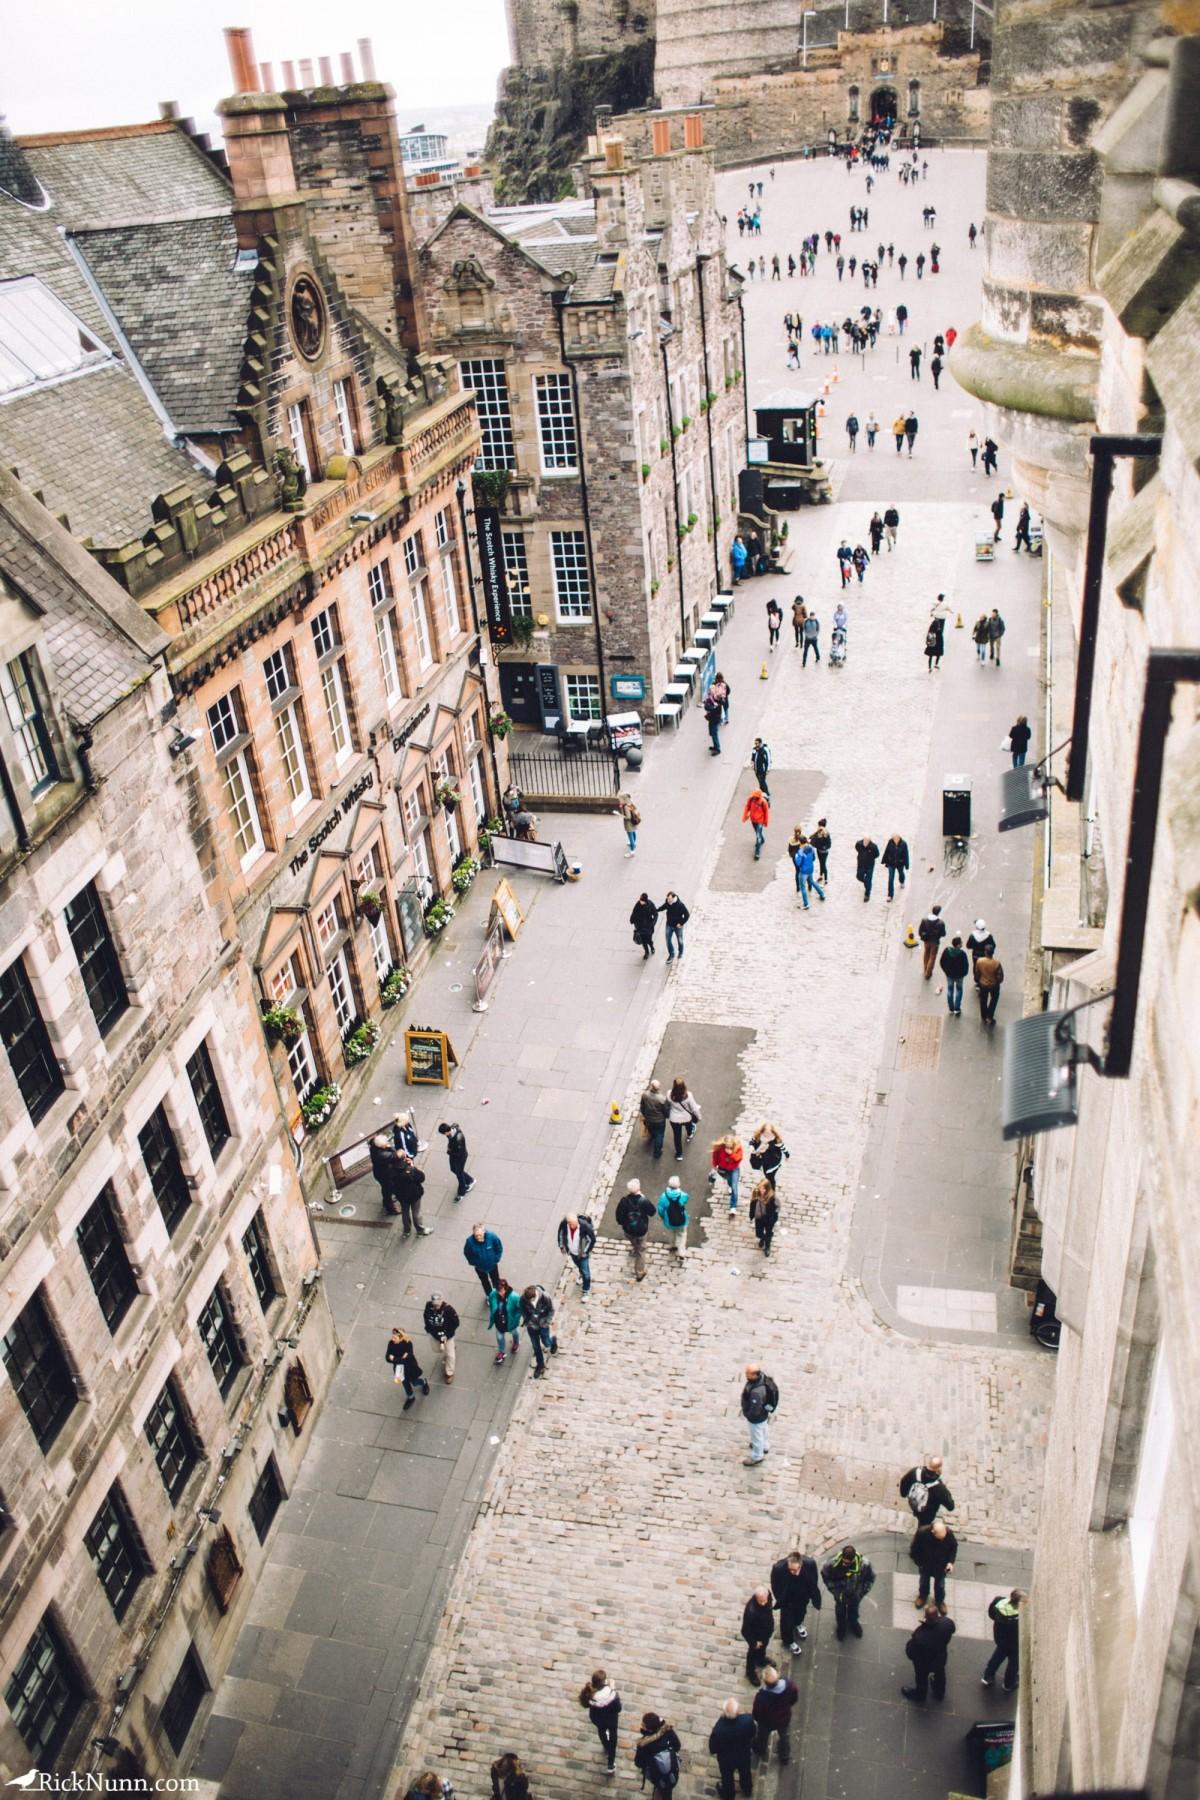 Edinburgh in May - 03-City-RL4B6866 Photographed by Rick Nunn